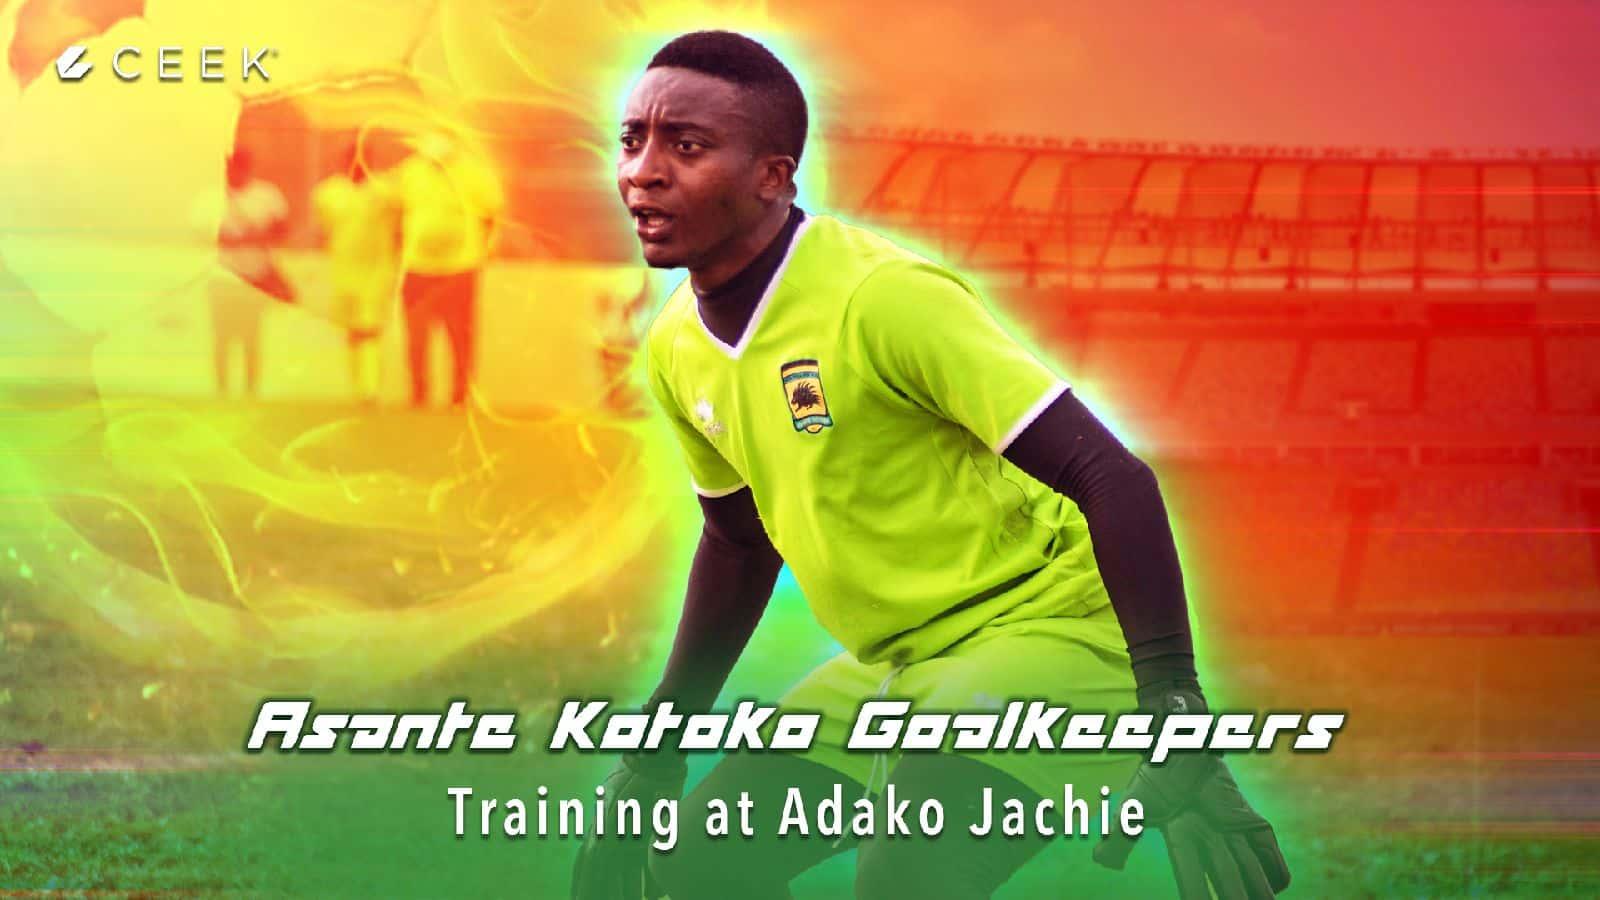 Goalkeepers training at Adako Jachie